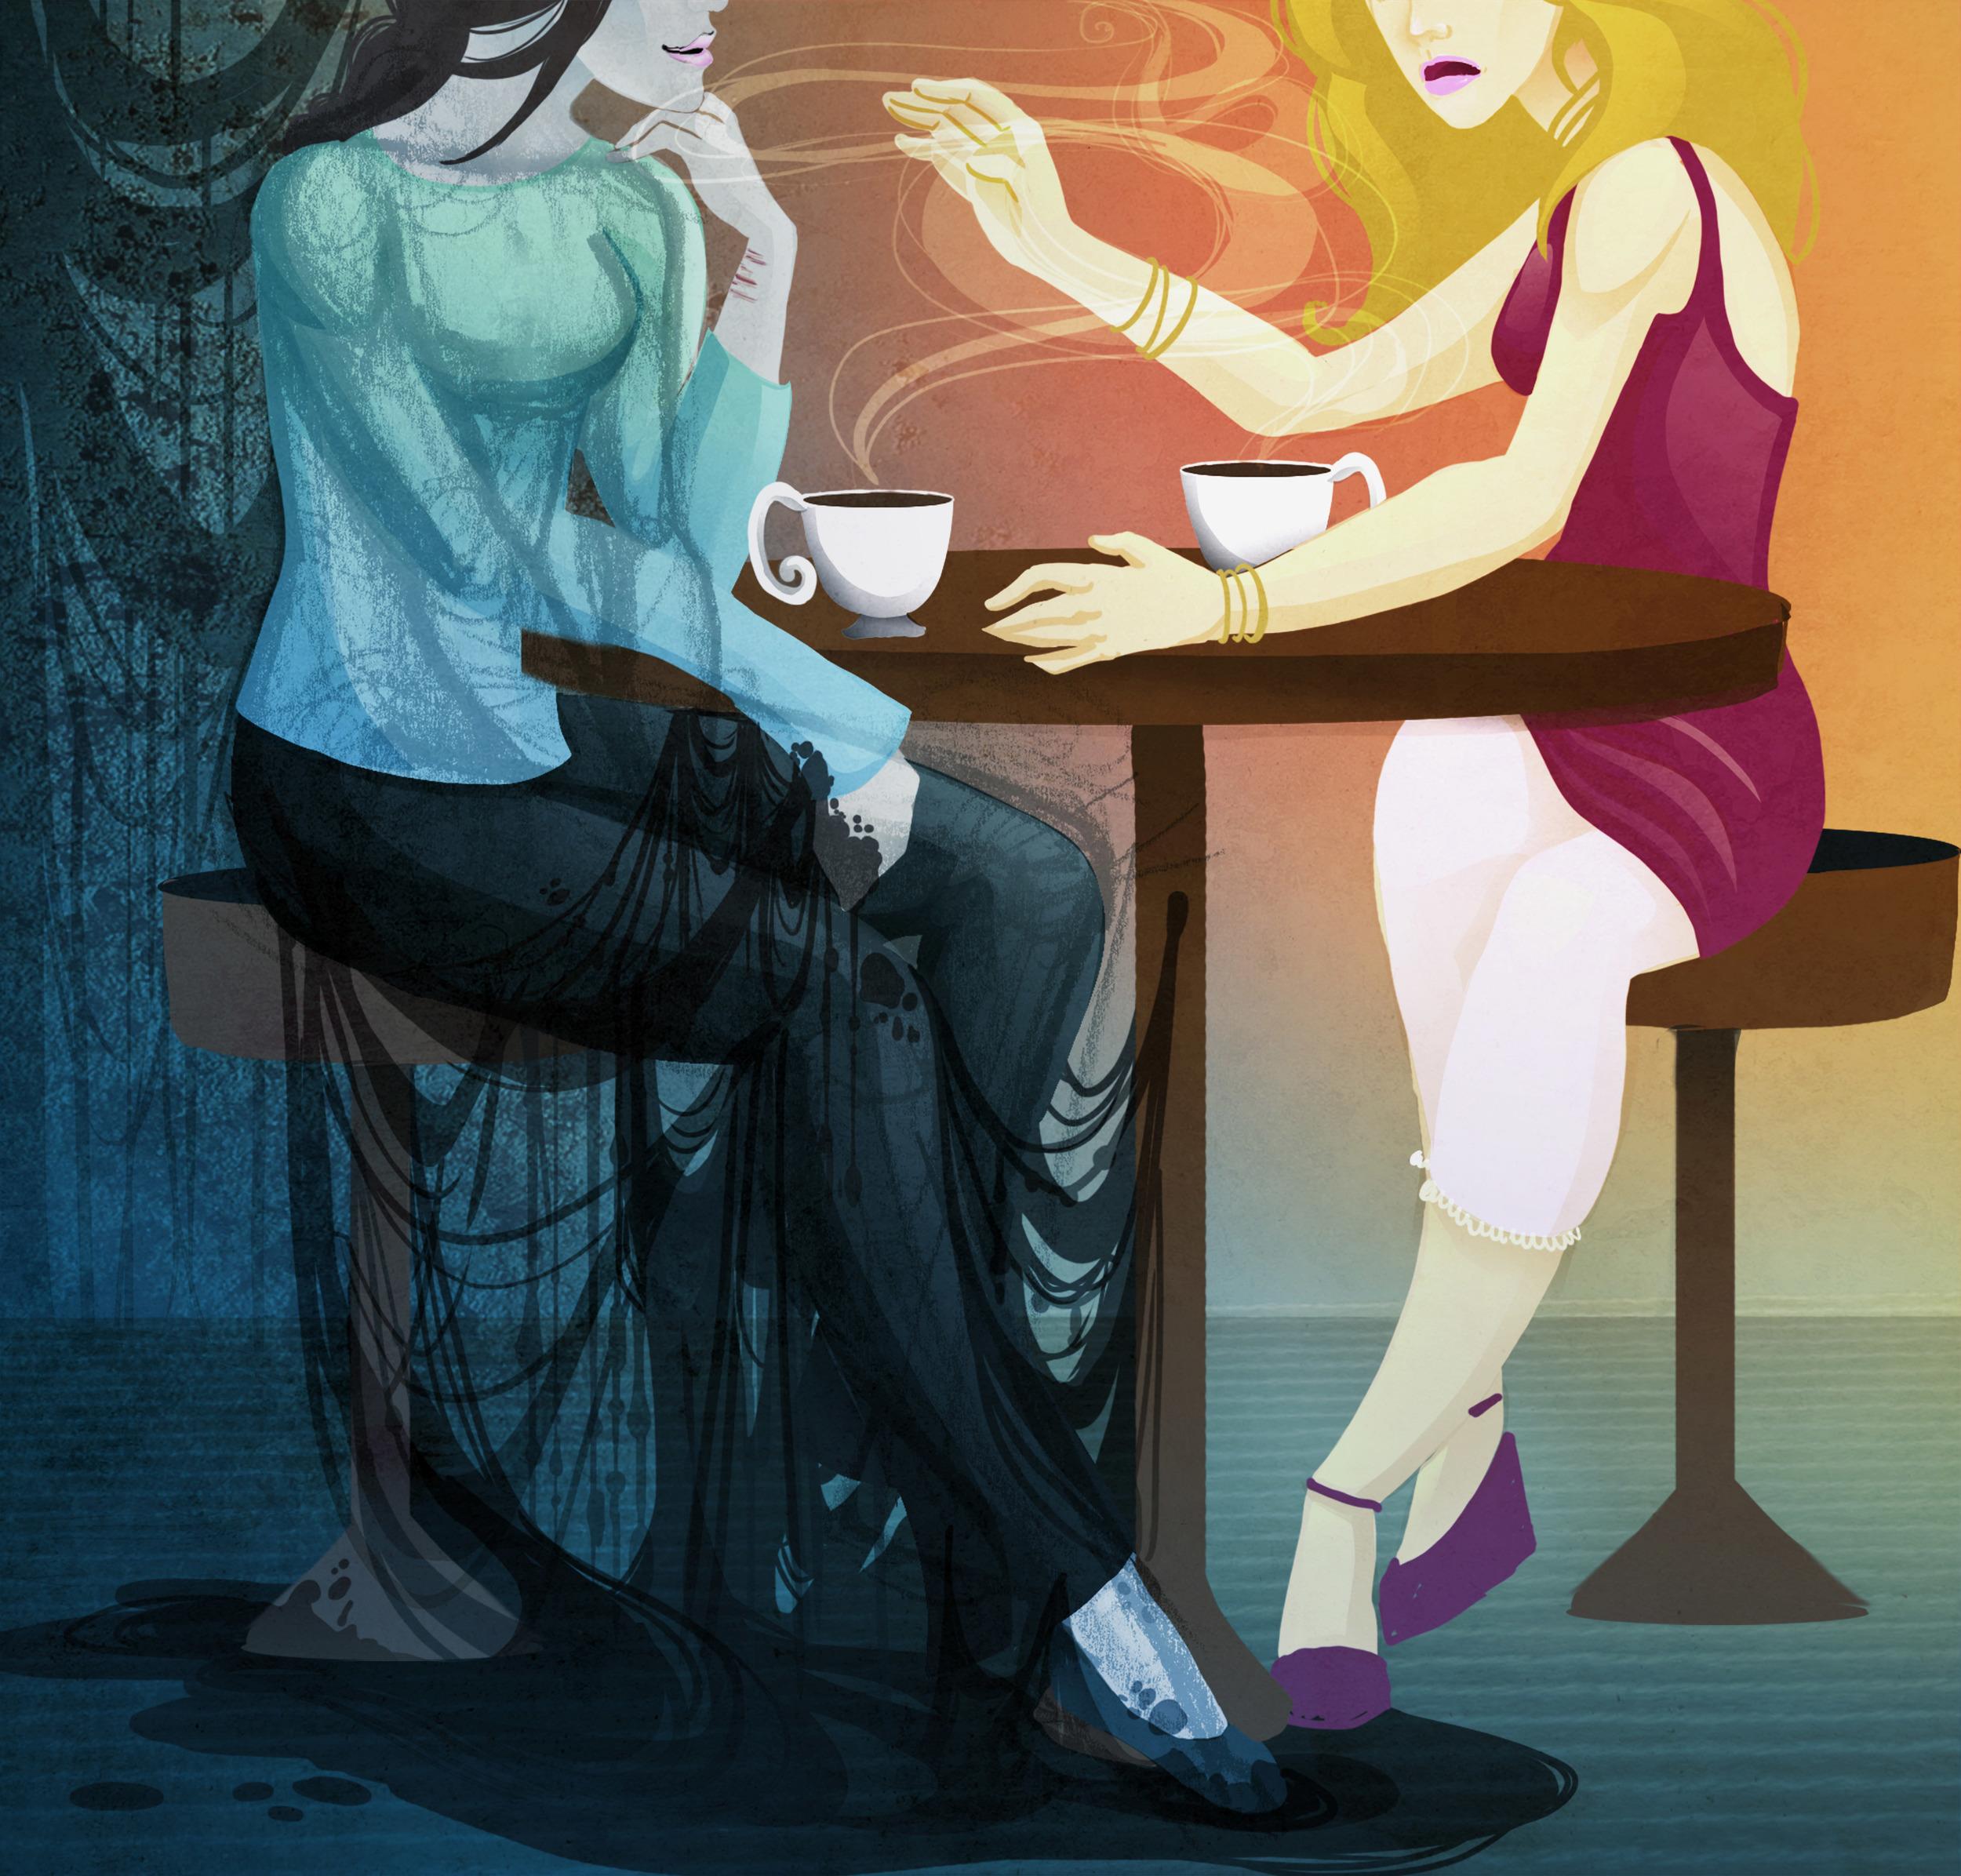 depression-beneath-the-surface-illustration